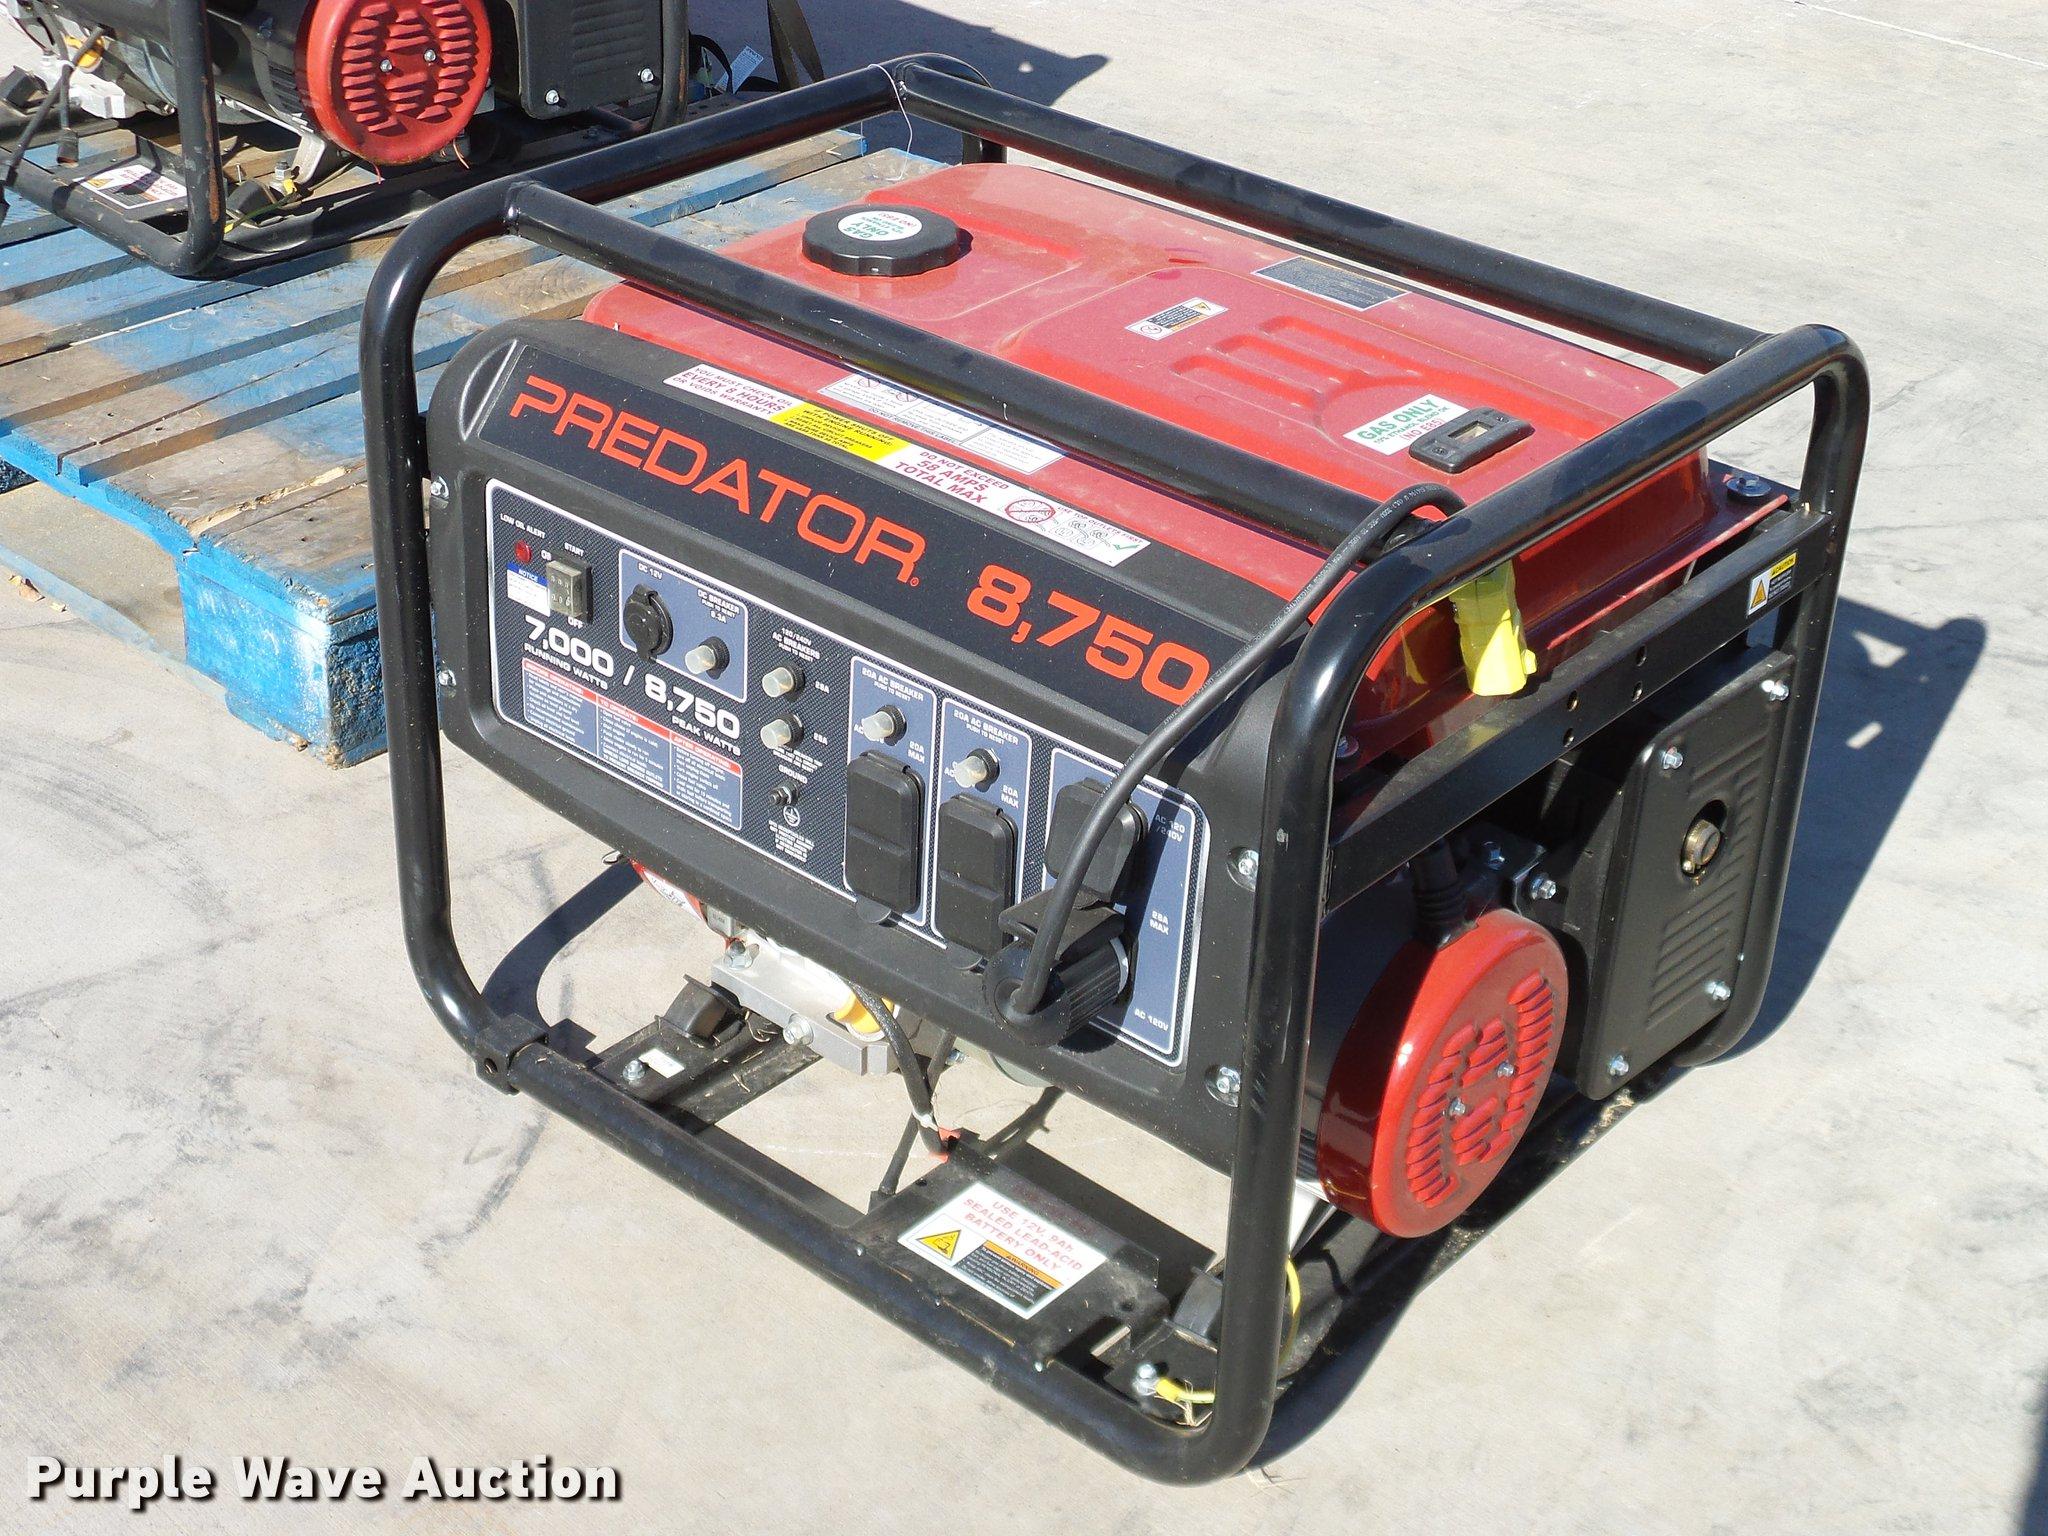 Predator 8750 generator Item AZ9274